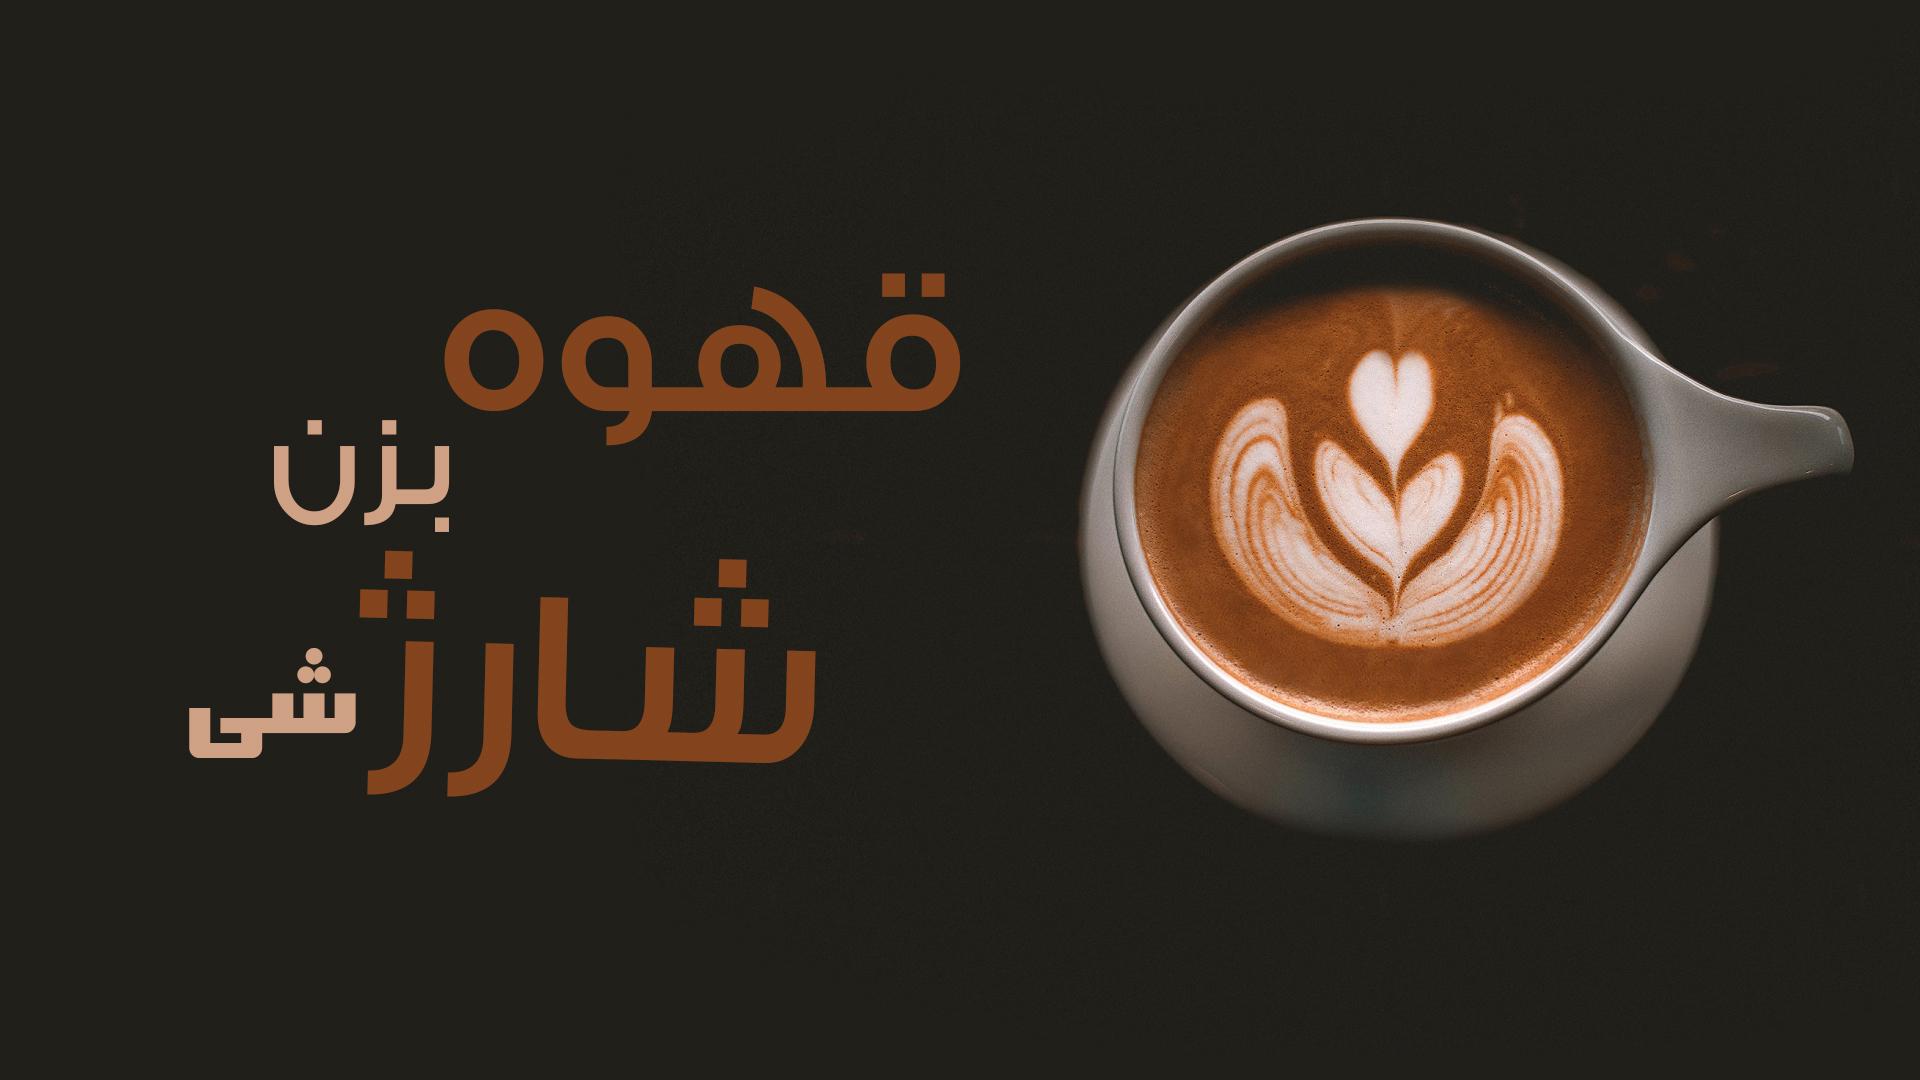 قهوه بزن شارژ شی!